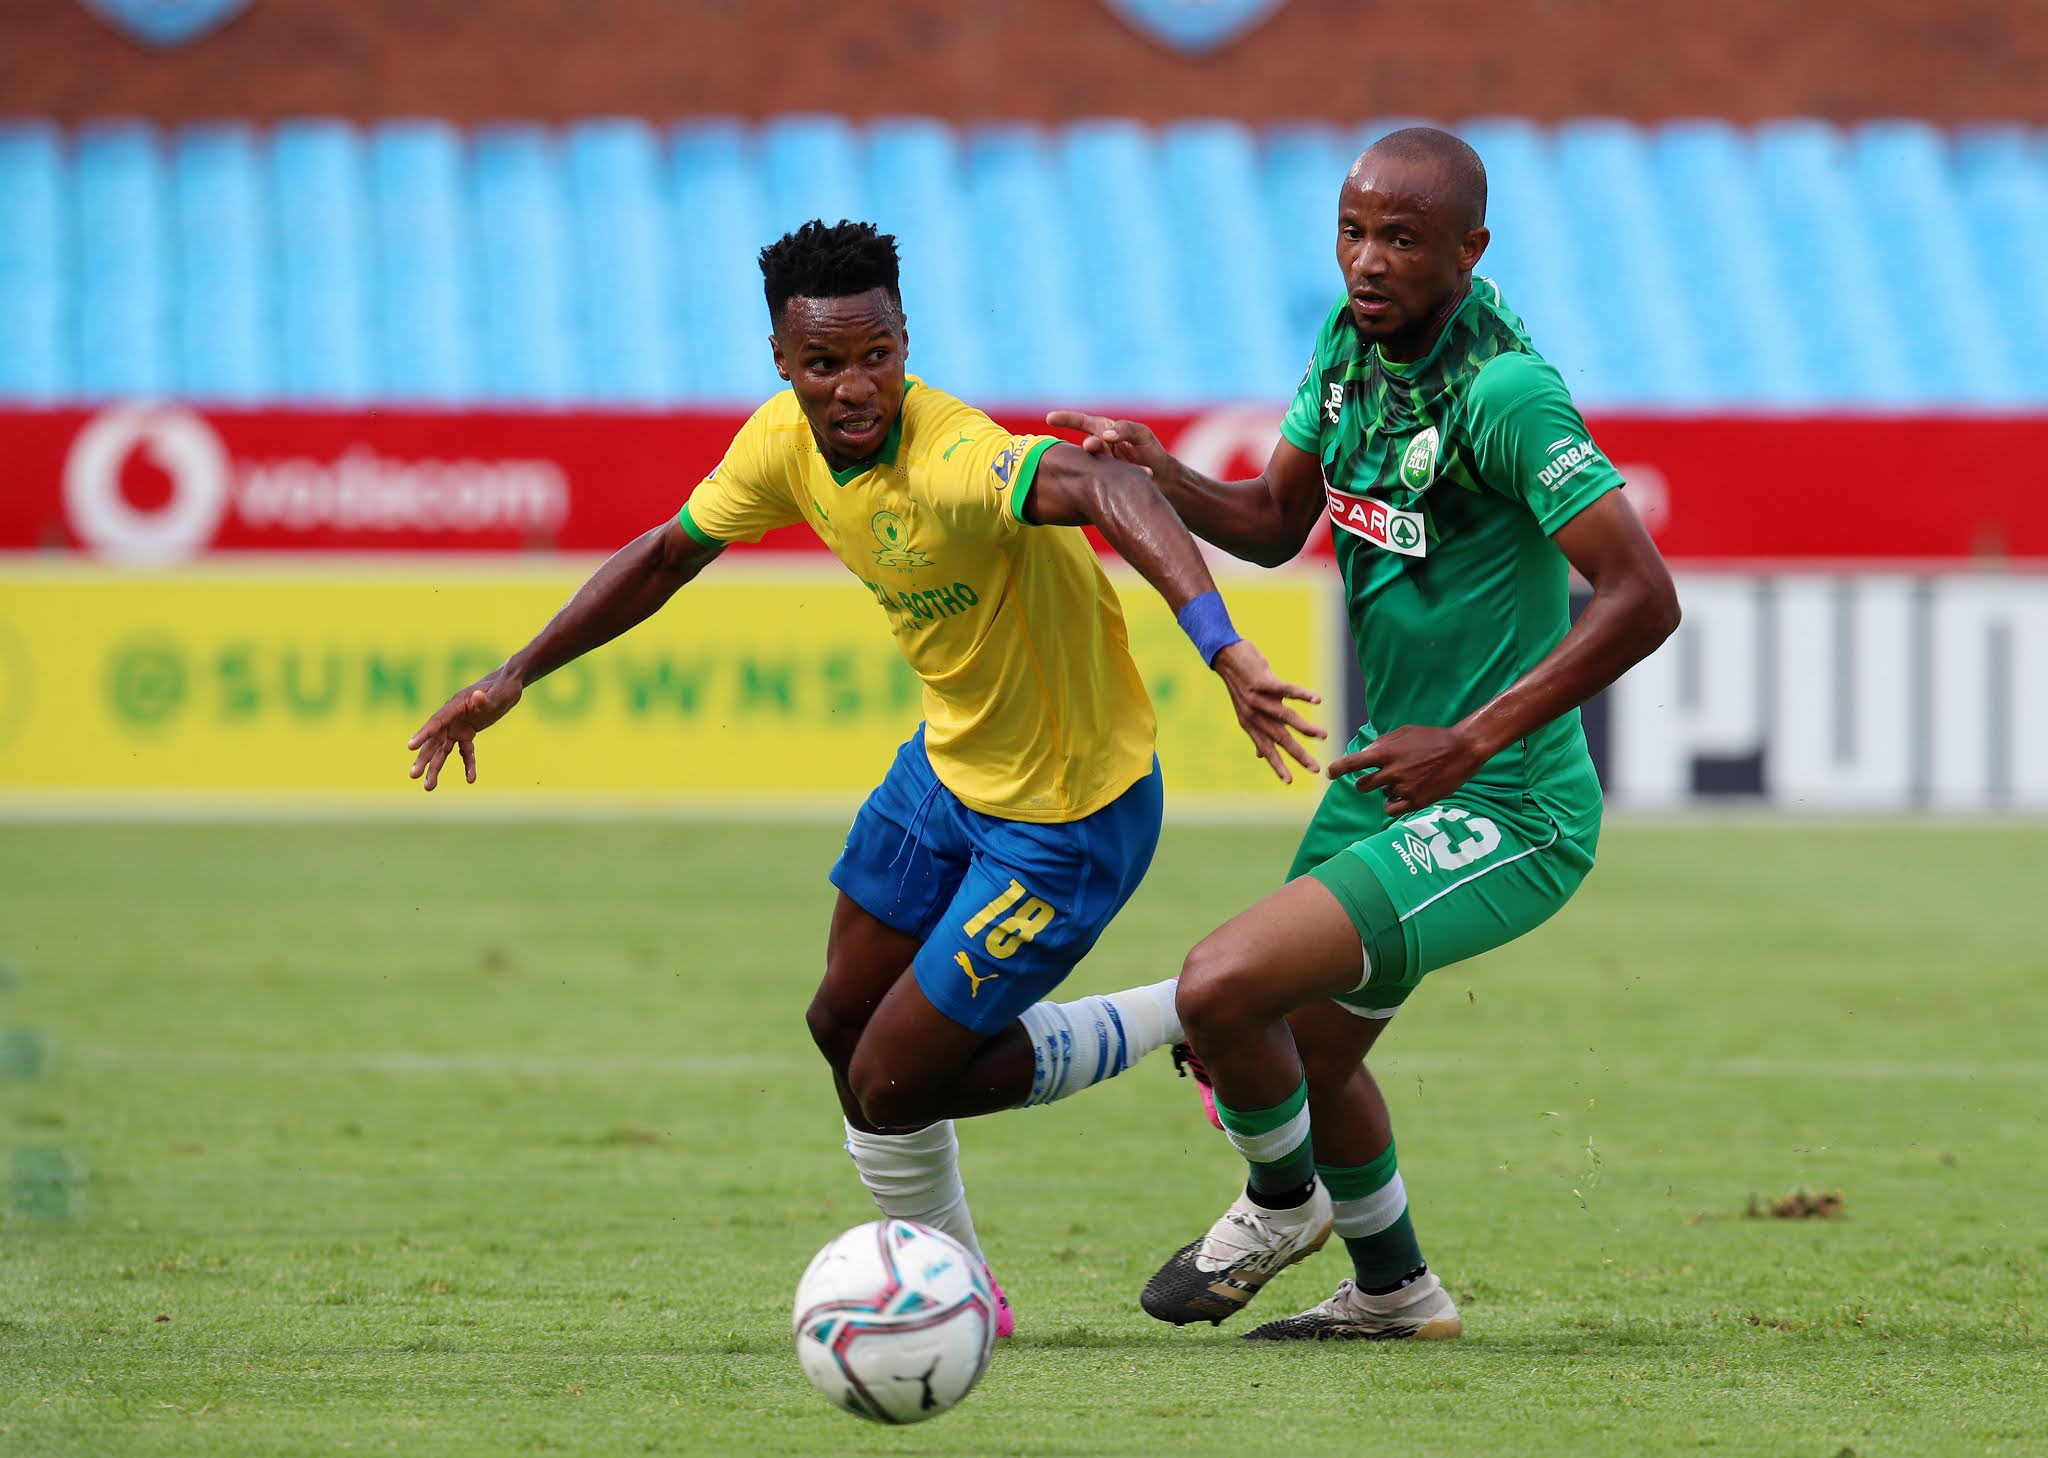 Themba Zwane in action against AmaZulu